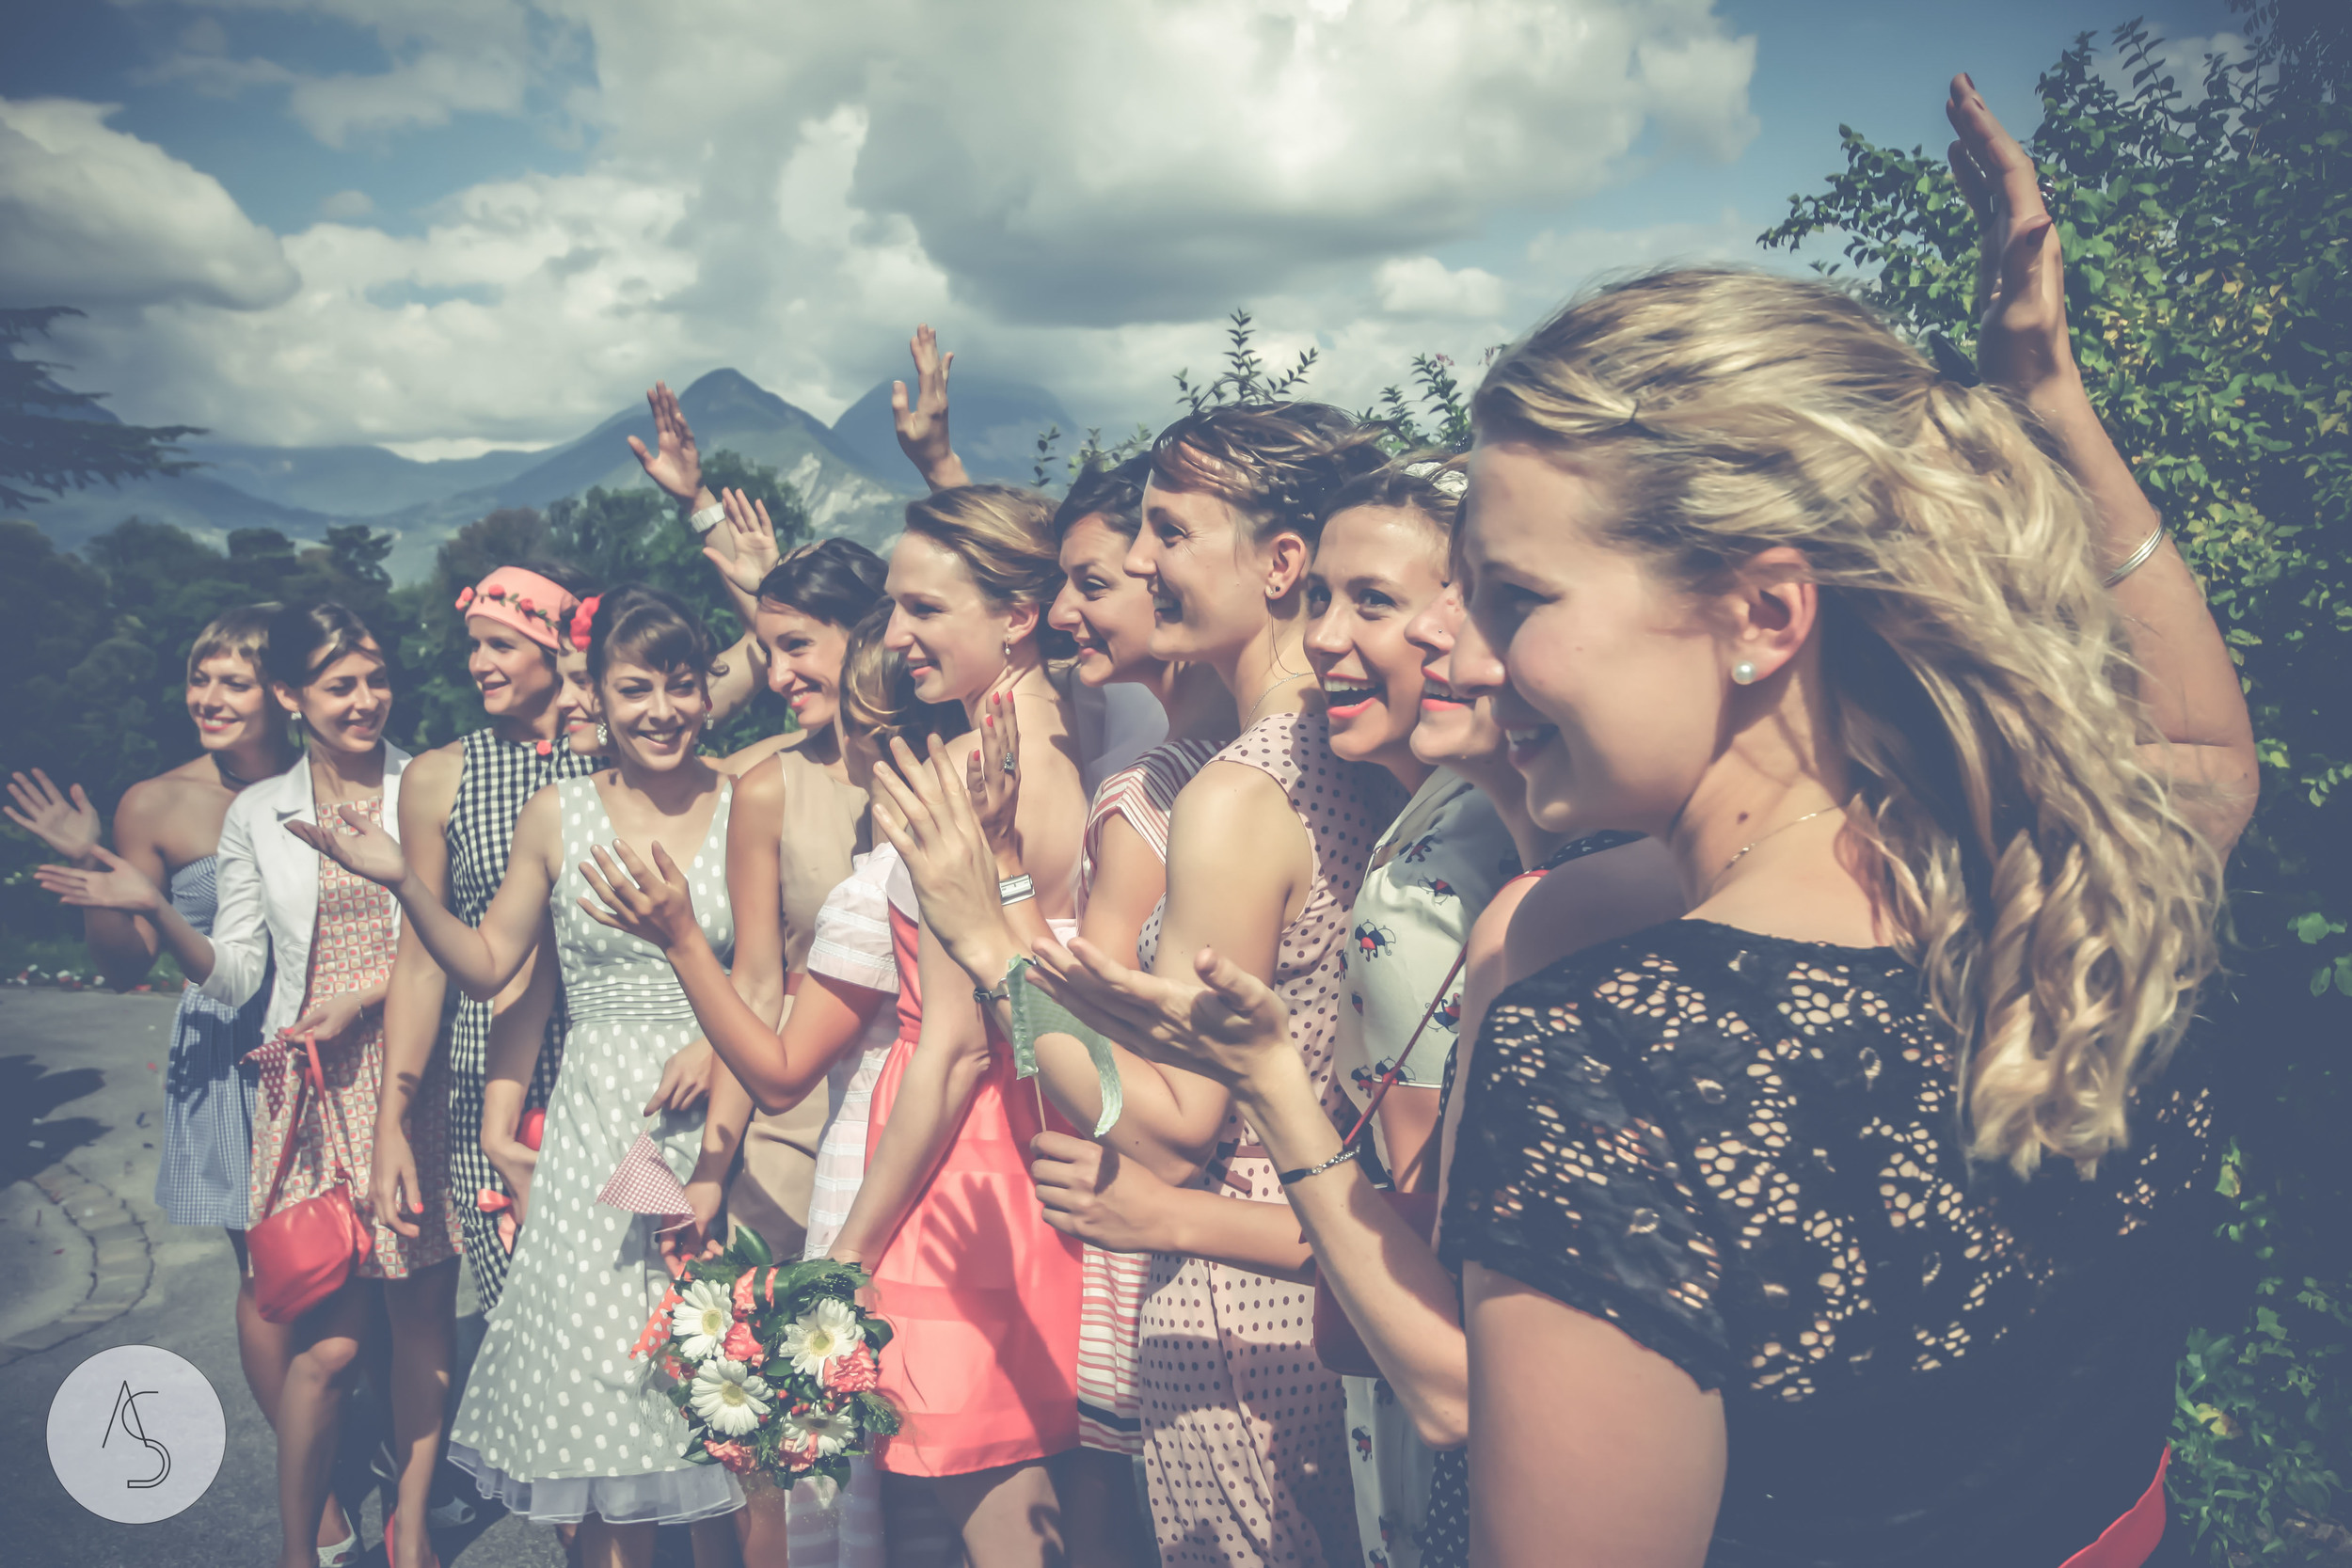 photographe mariage - Grenoble - Rhone Alpes - Adriana Salazar photo-90.jpg